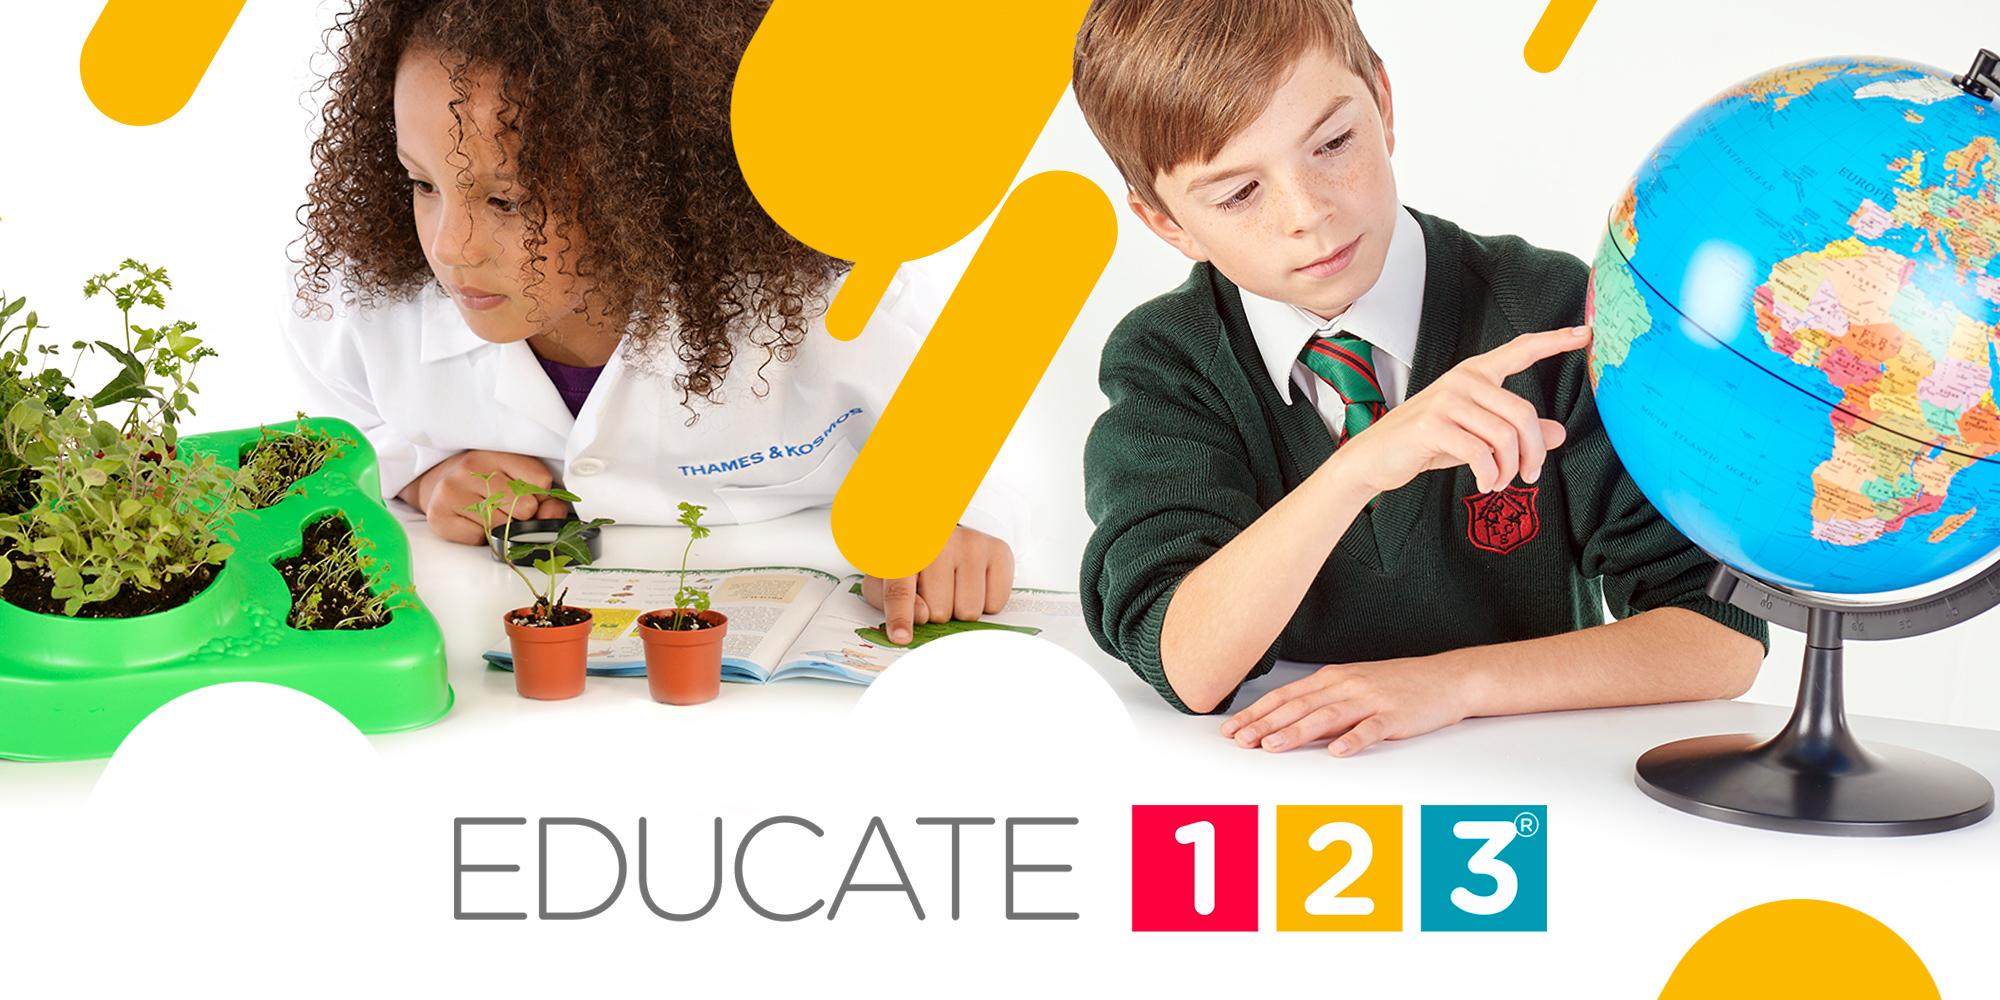 Educate 123